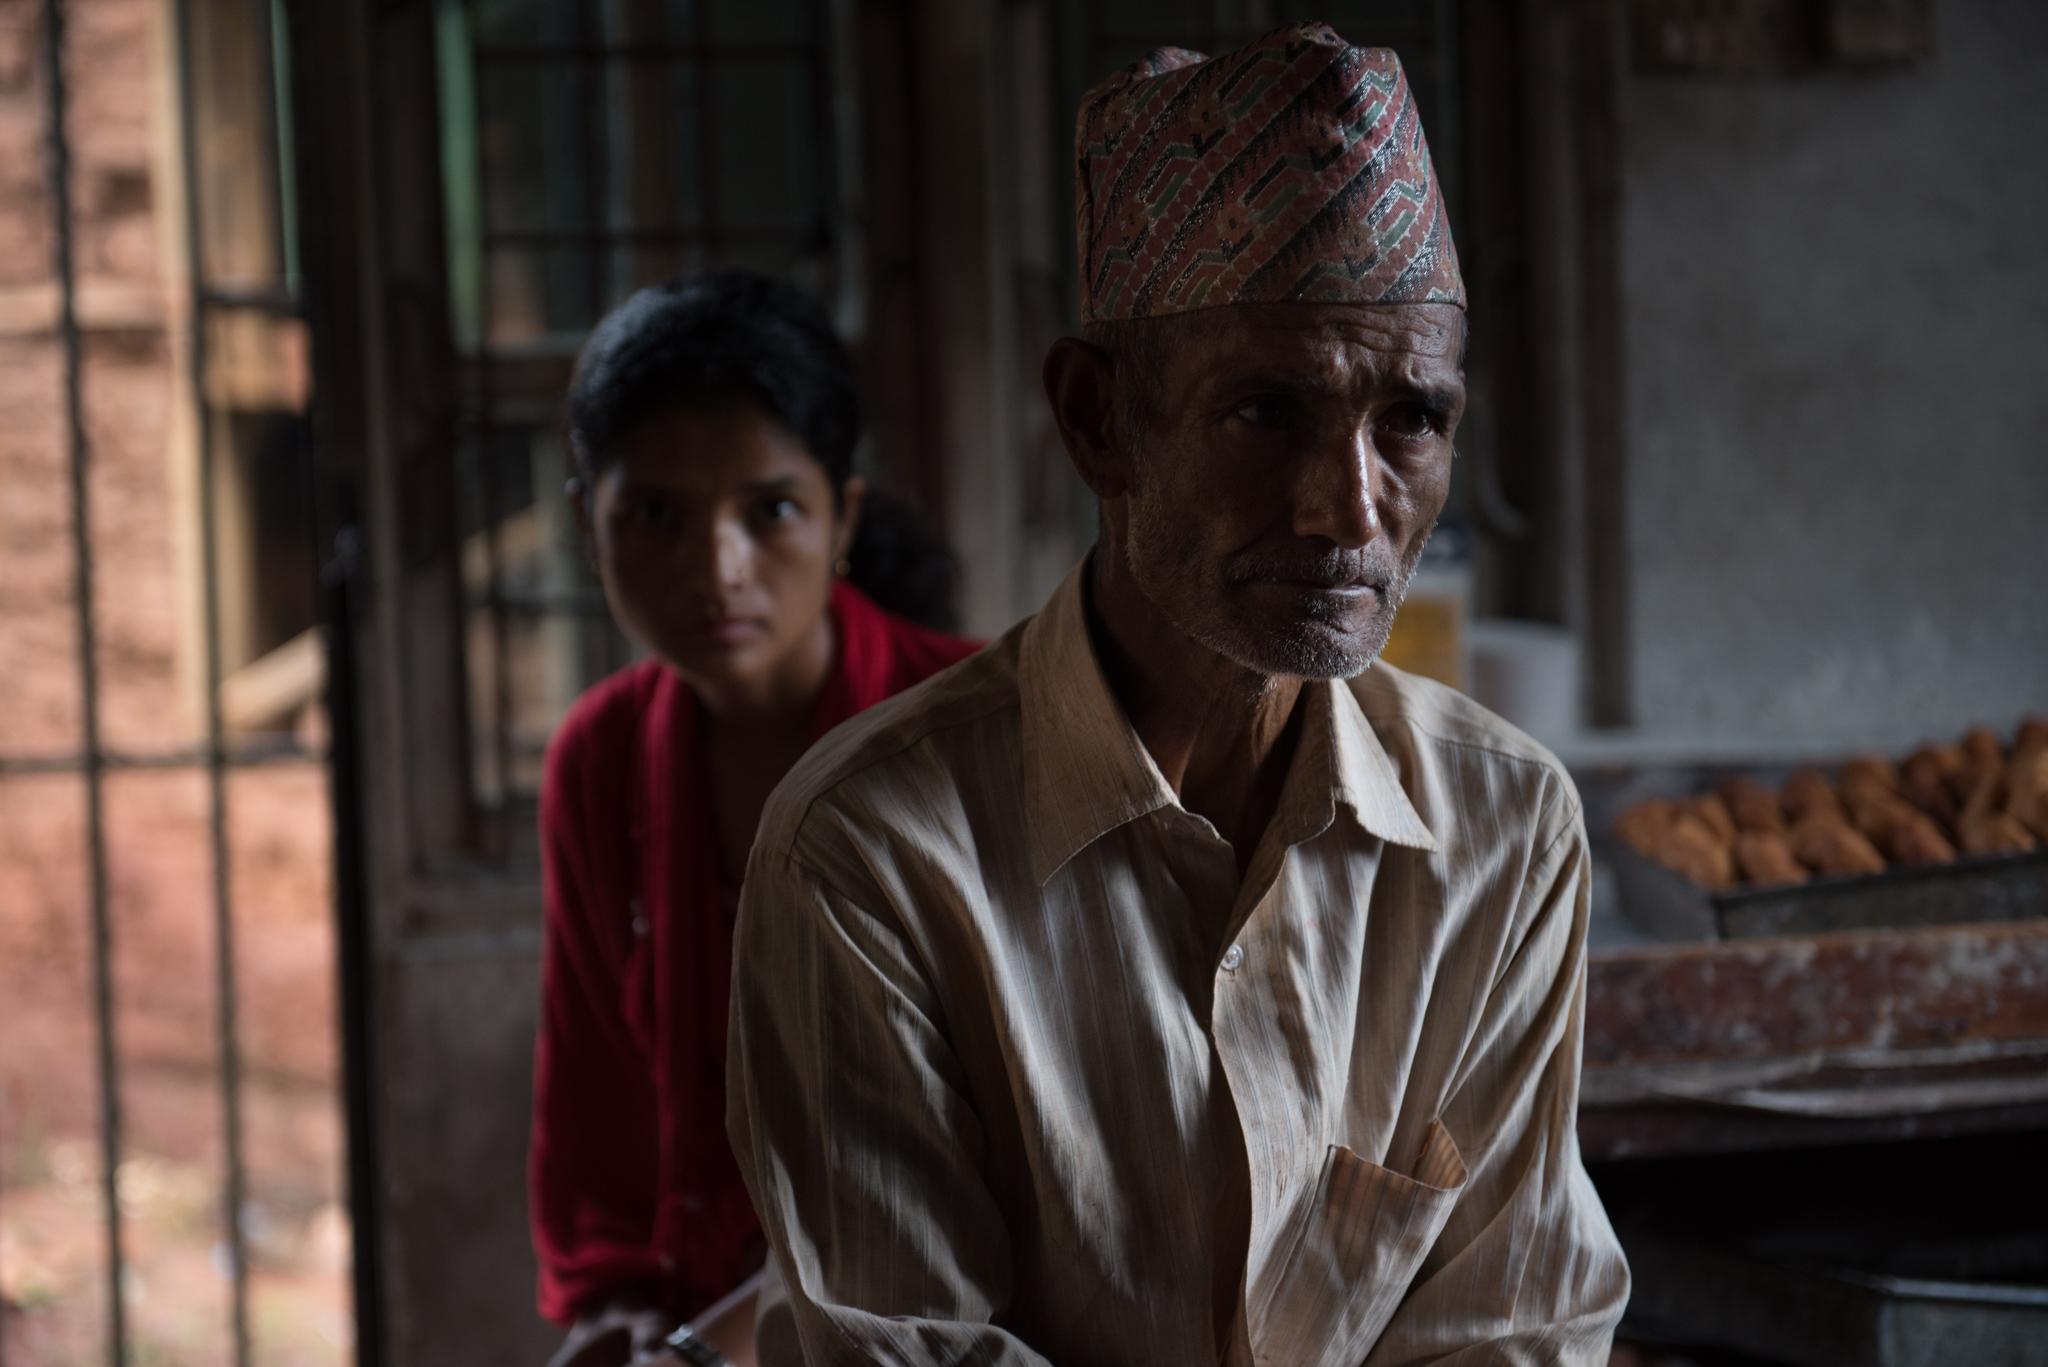 Ram Kumar Kandel and his daughter Devi.